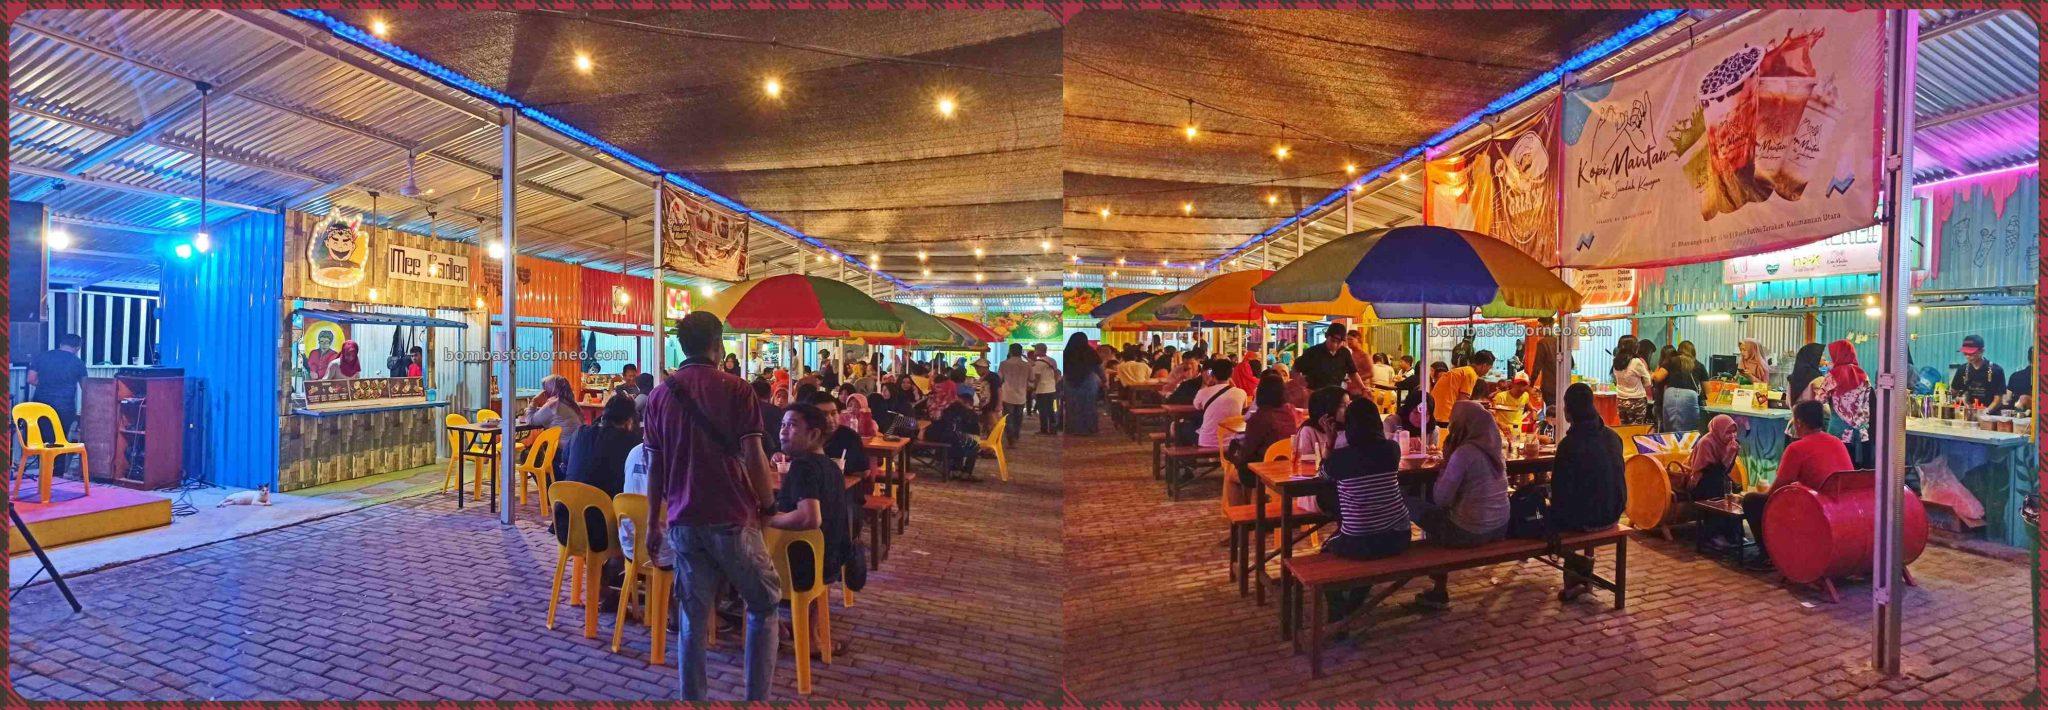 backpackers, destination, exploration, Obyek wisata, Tourism, Kaltara, Food Court, Cross Border, Borneo, 印尼北加里曼丹, 打拉根岛旅游景点,